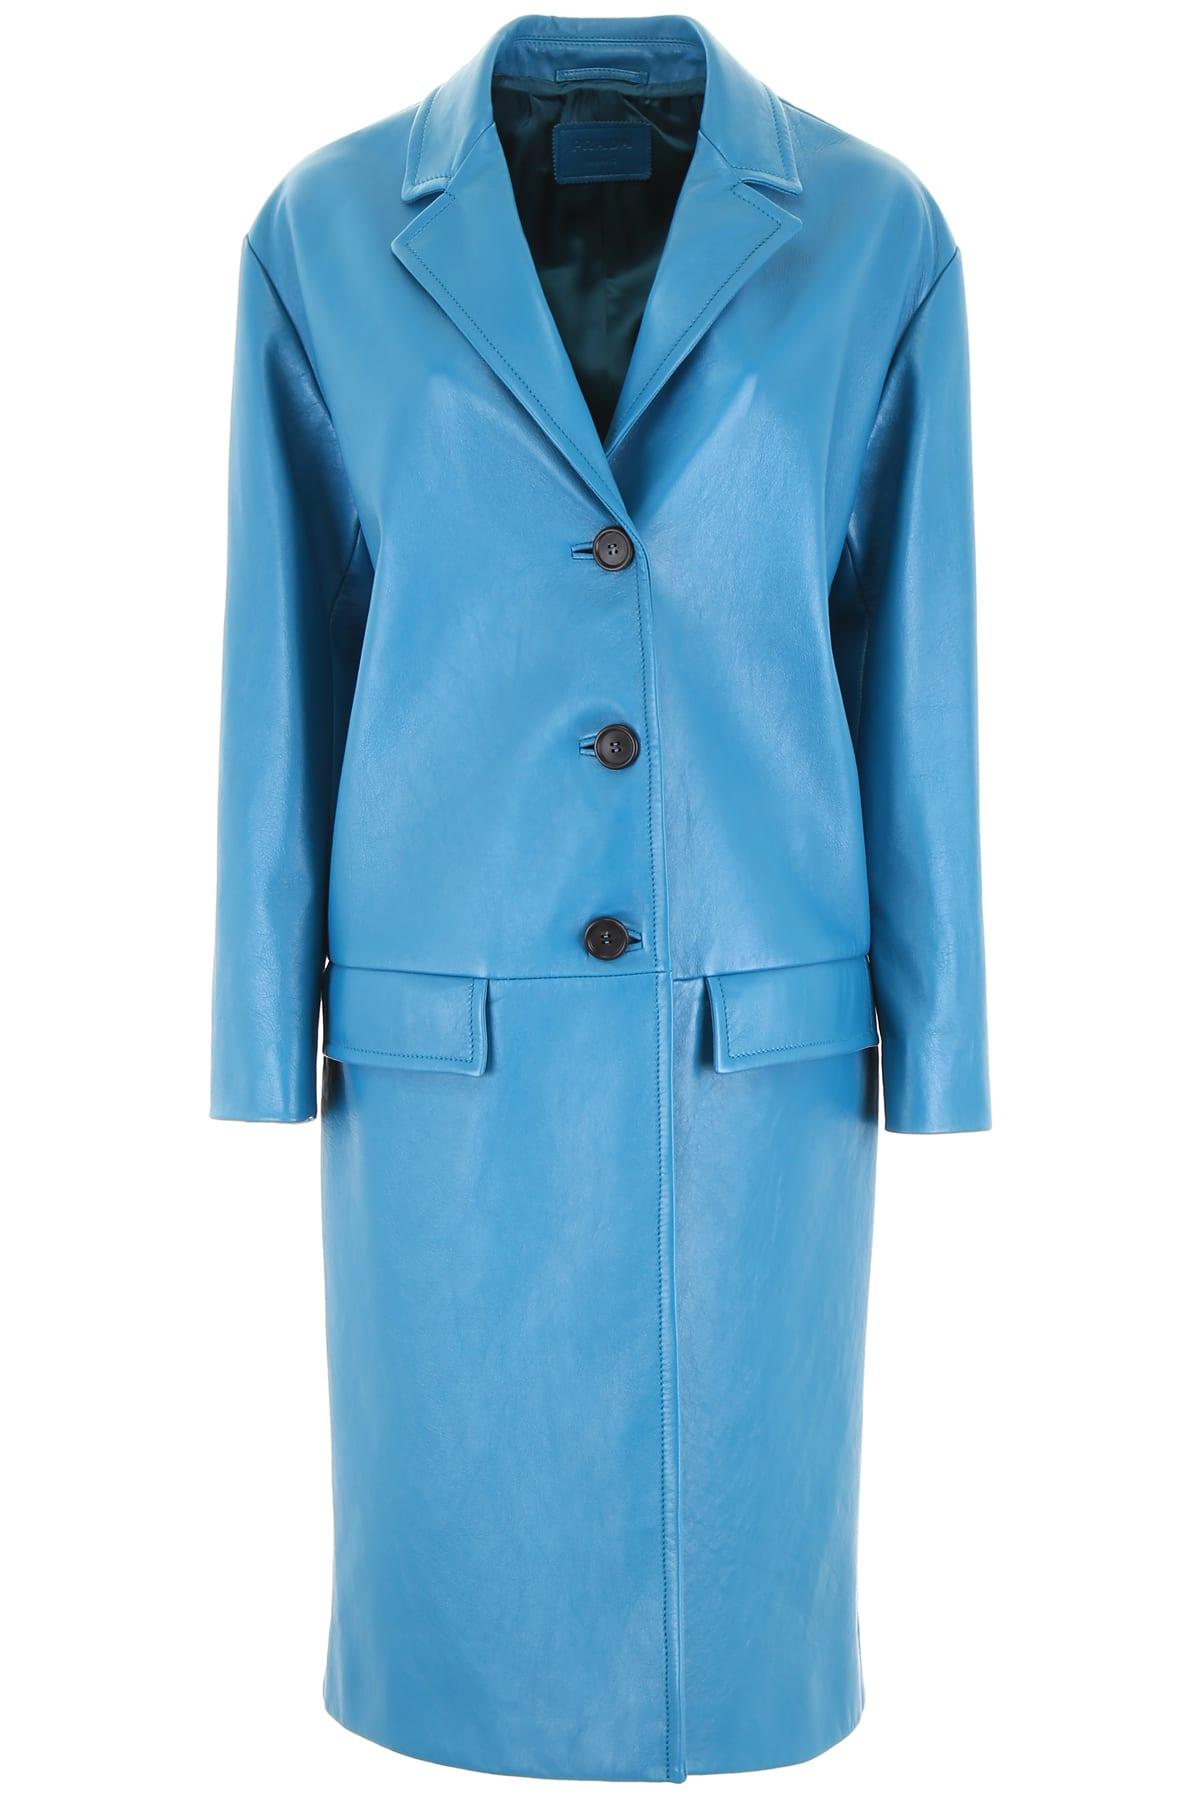 Prada Nappa Coat